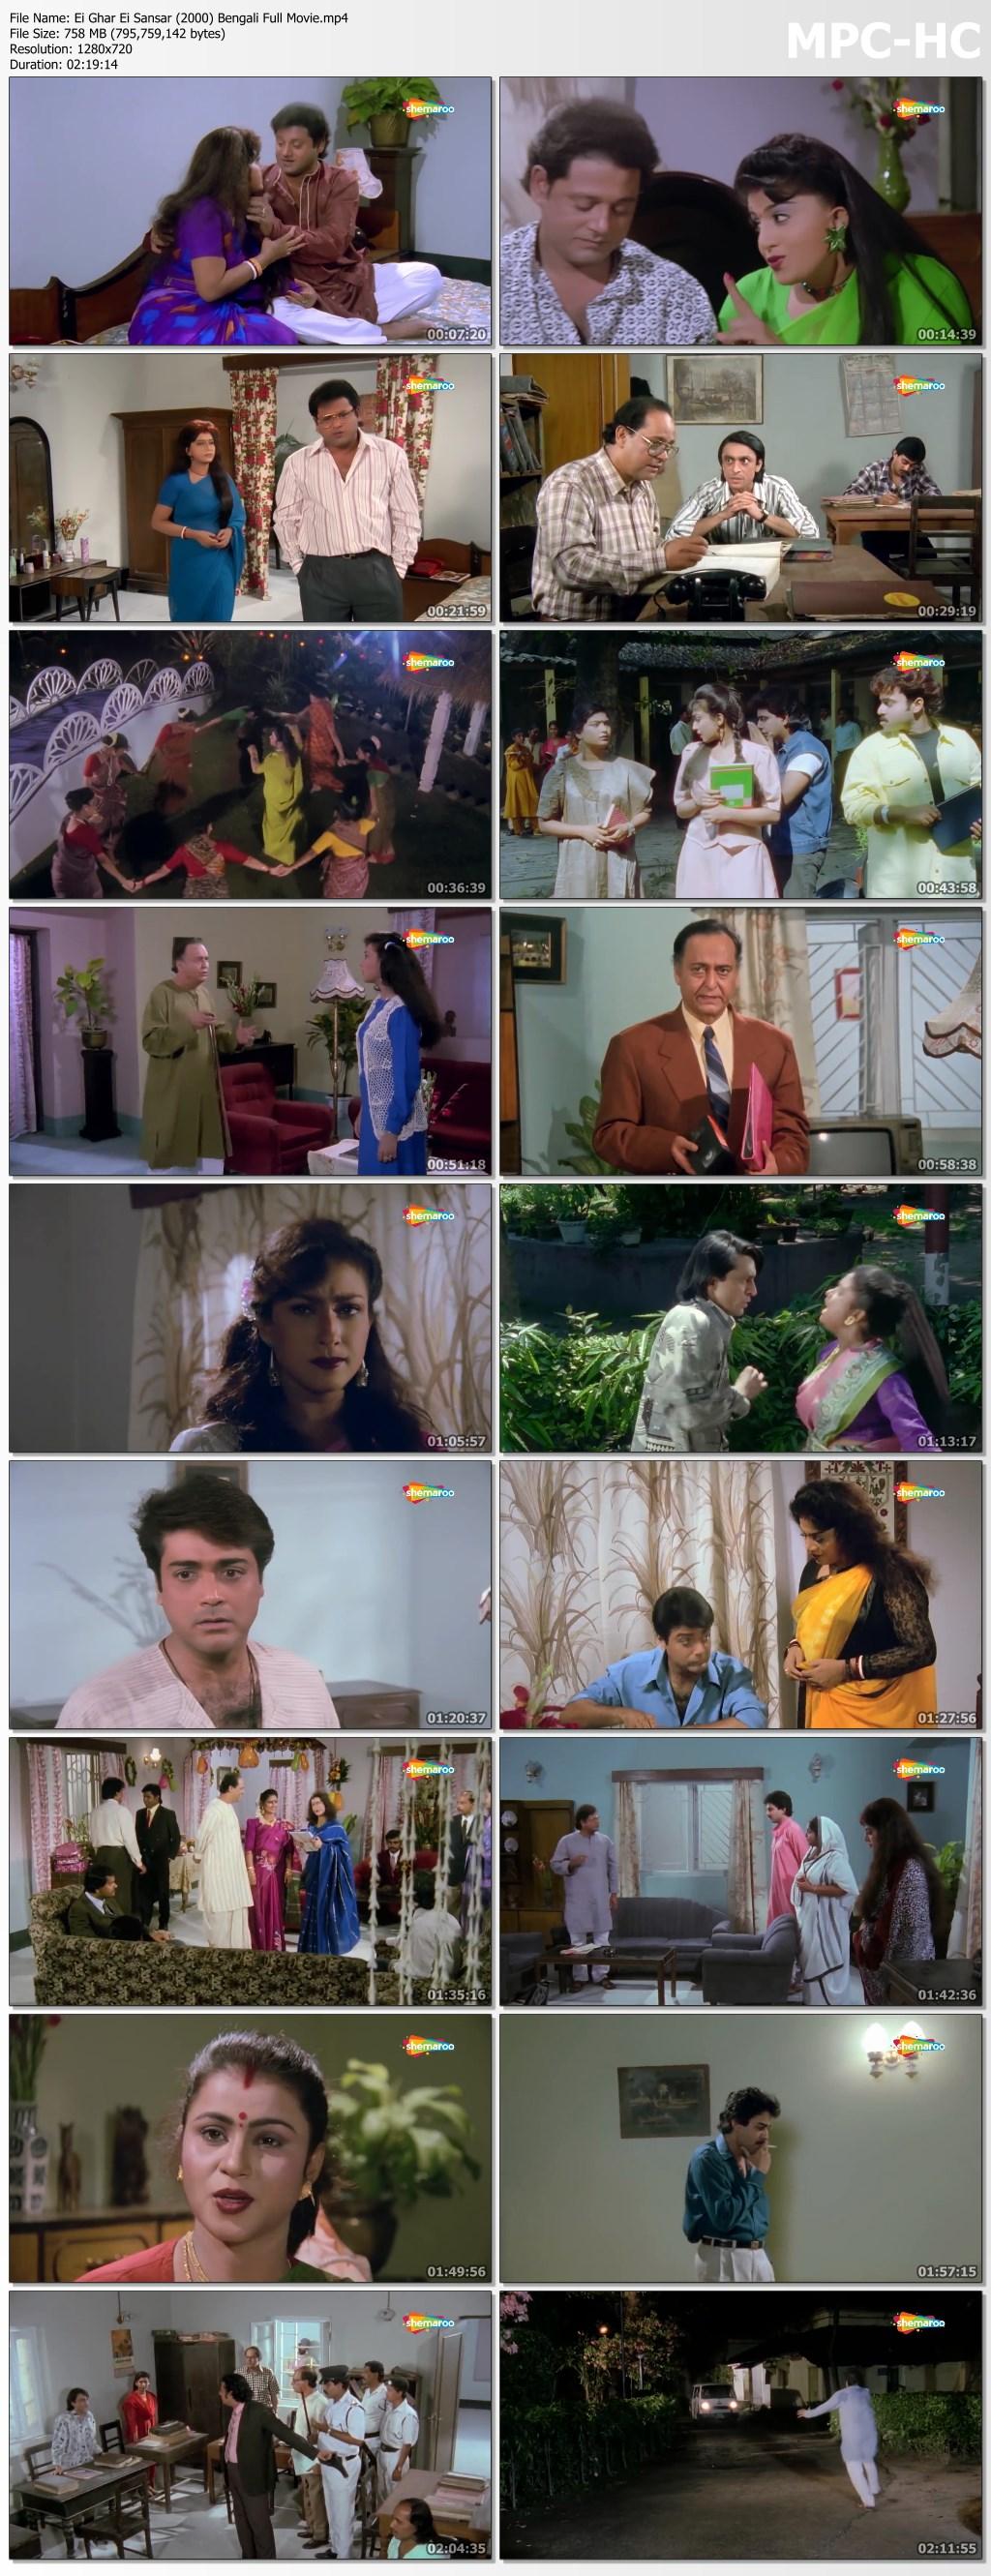 Ei Ghar Ei Sansar (2000) Bengali Full Movie.mp4 thumbs